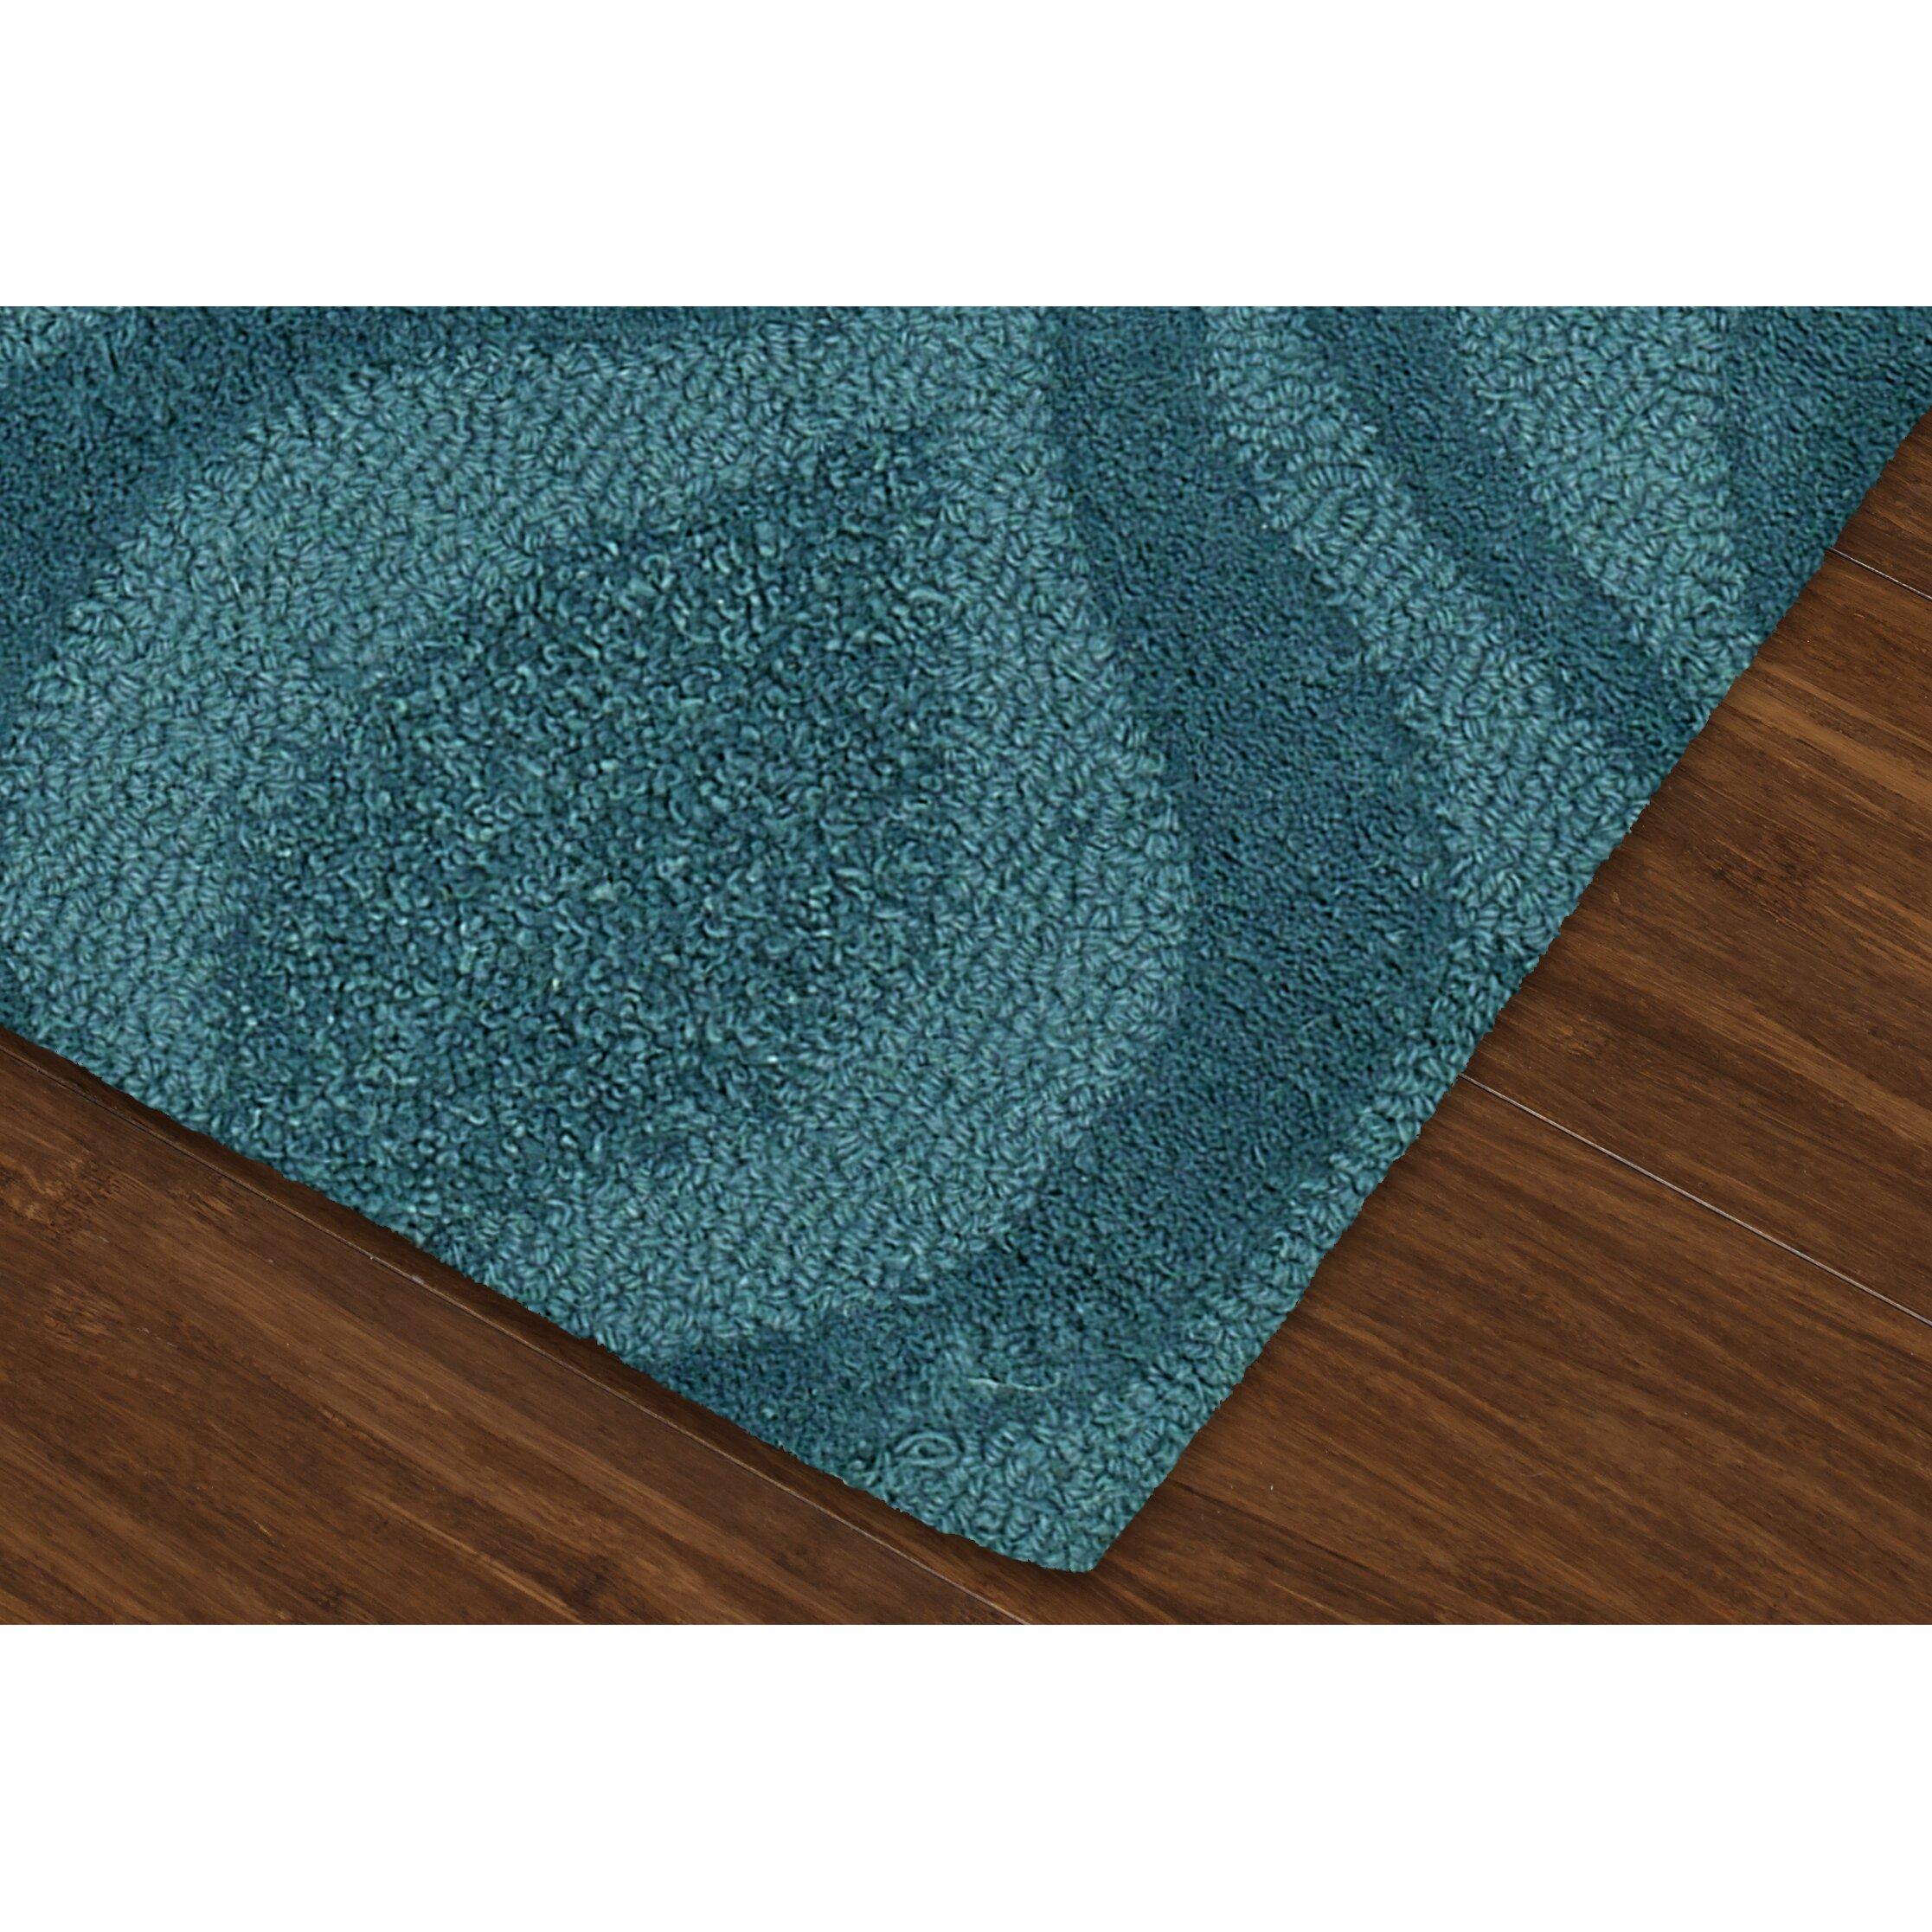 Tones Teal Area Rug